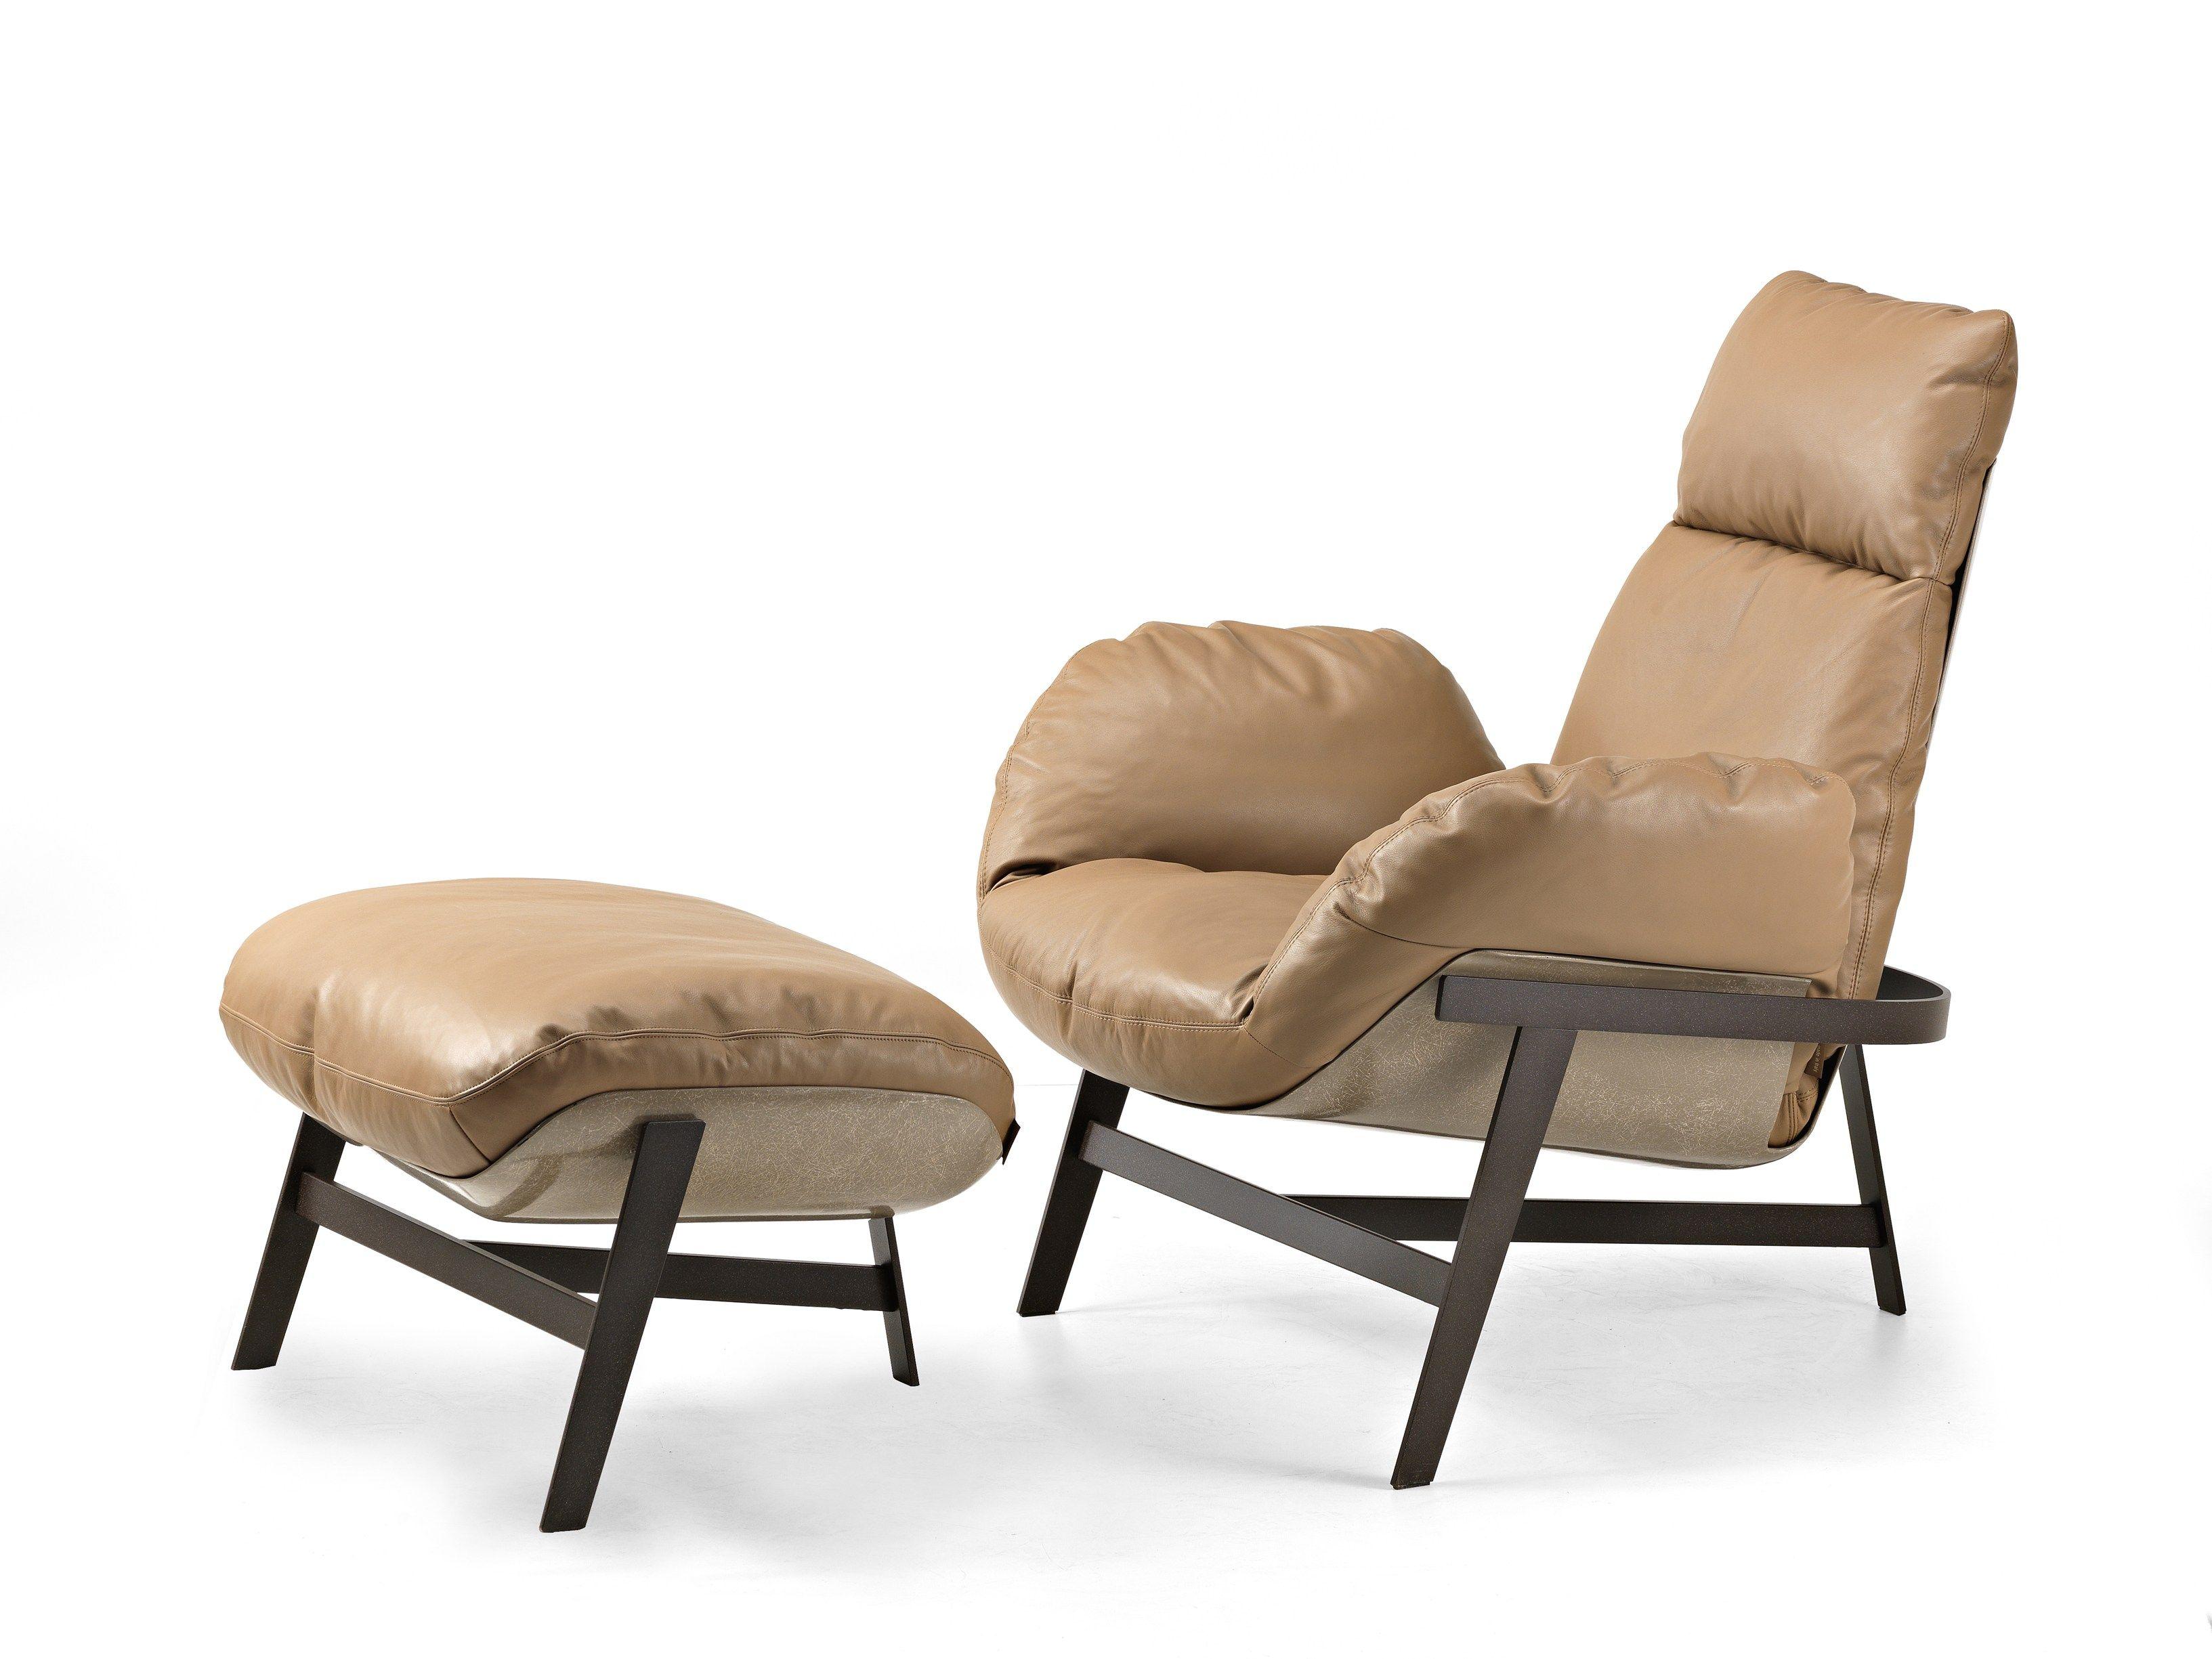 Leather Armchair Jupiter By Arketipo Design Mauro Lipparini